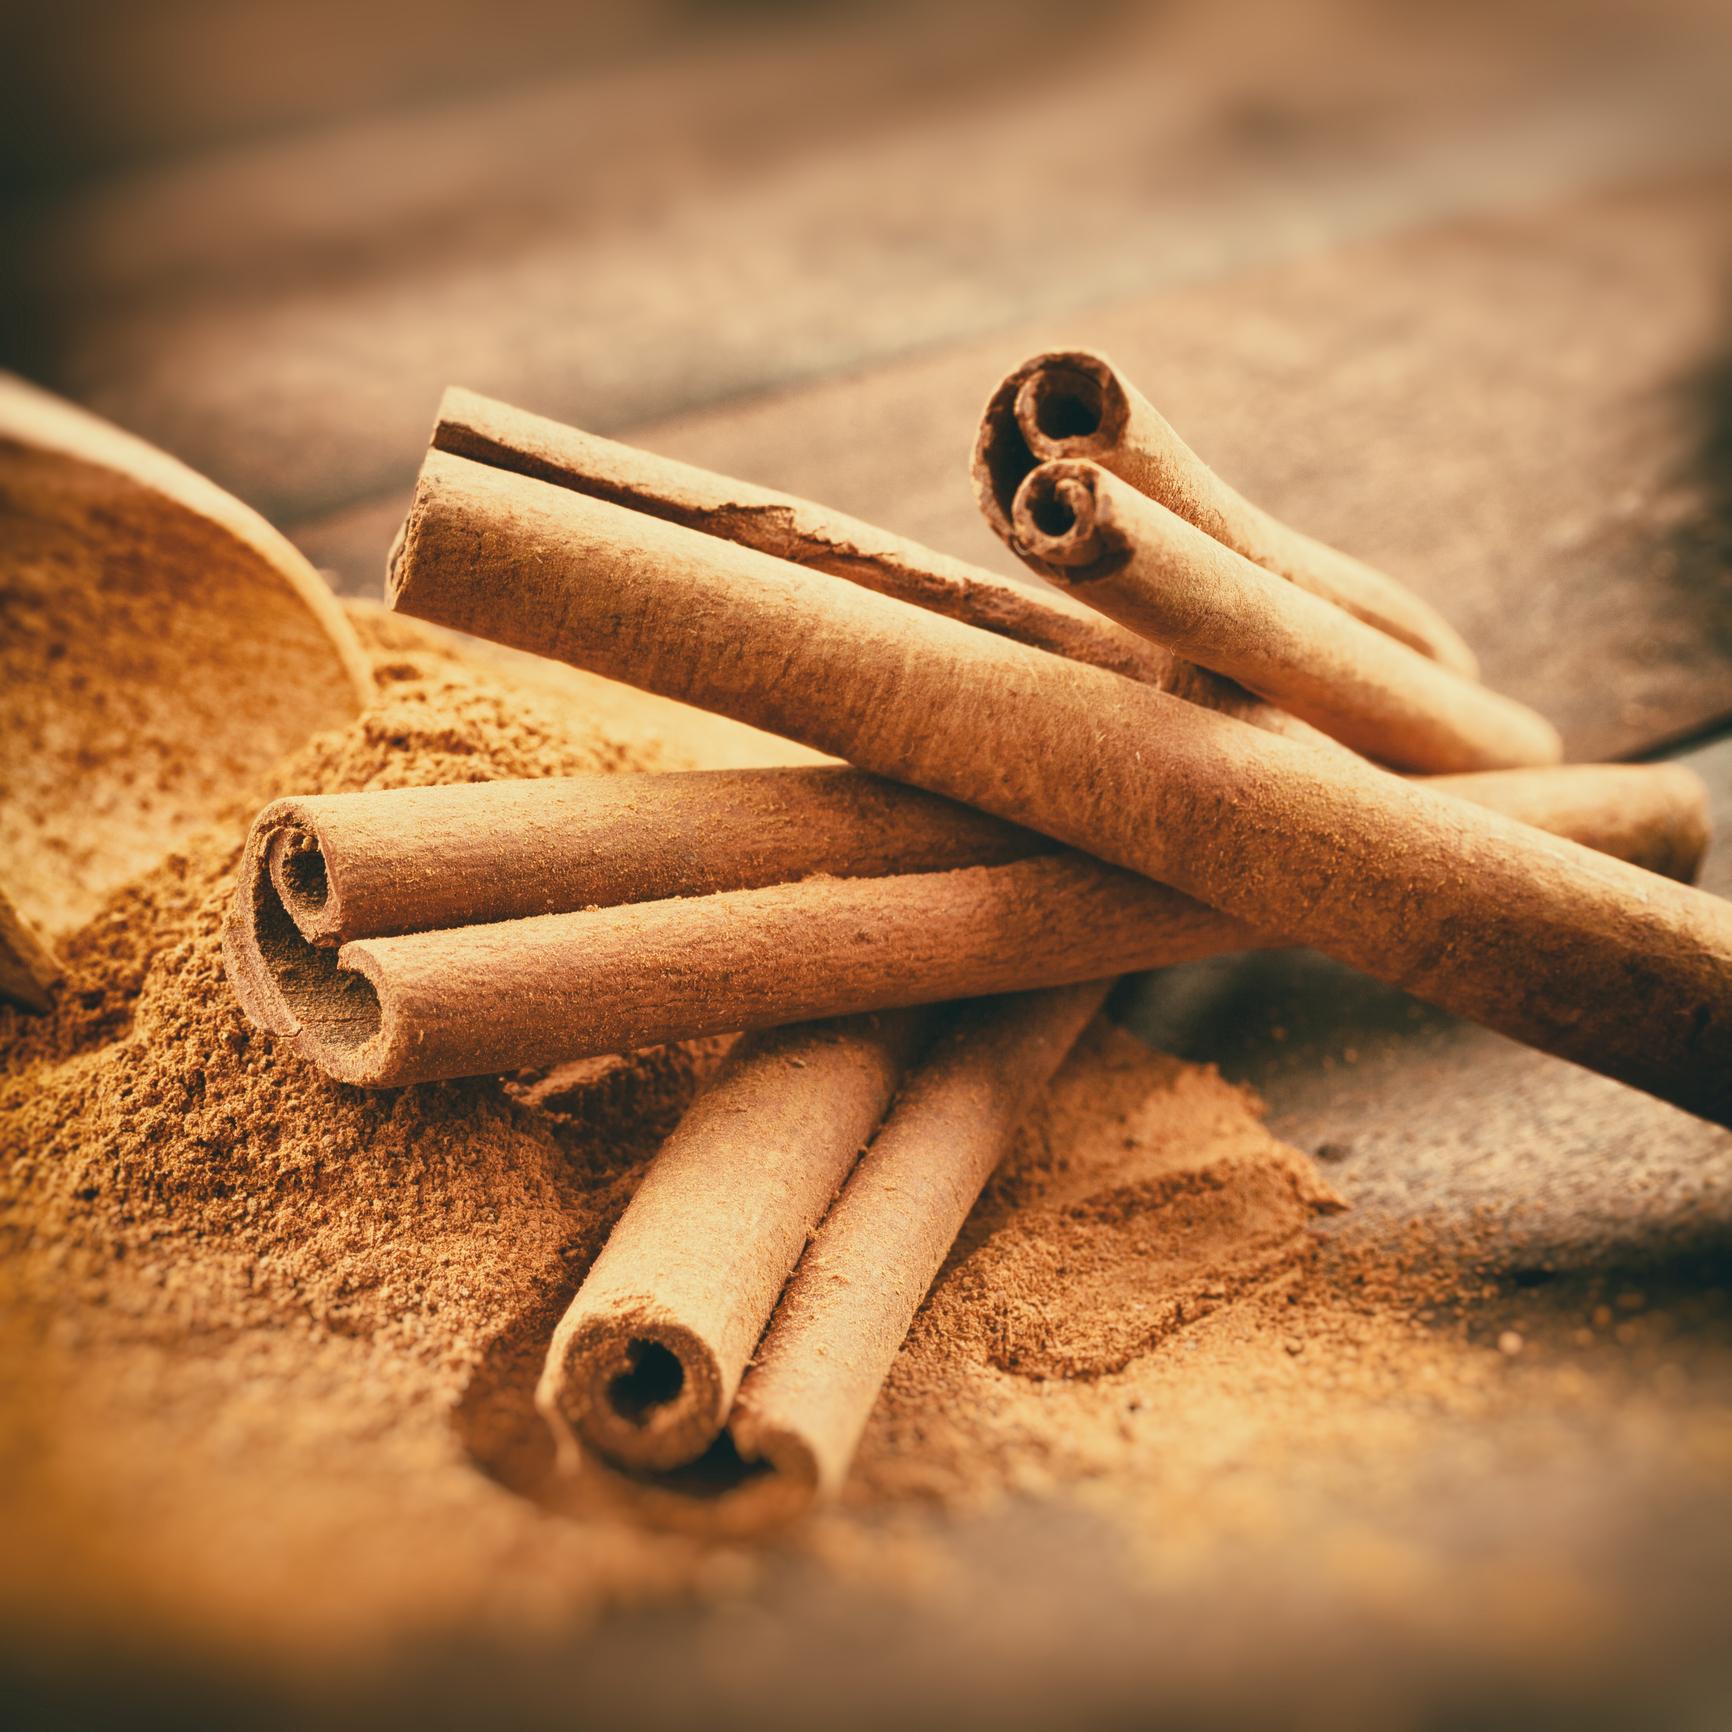 Cinnamon sticks and powder